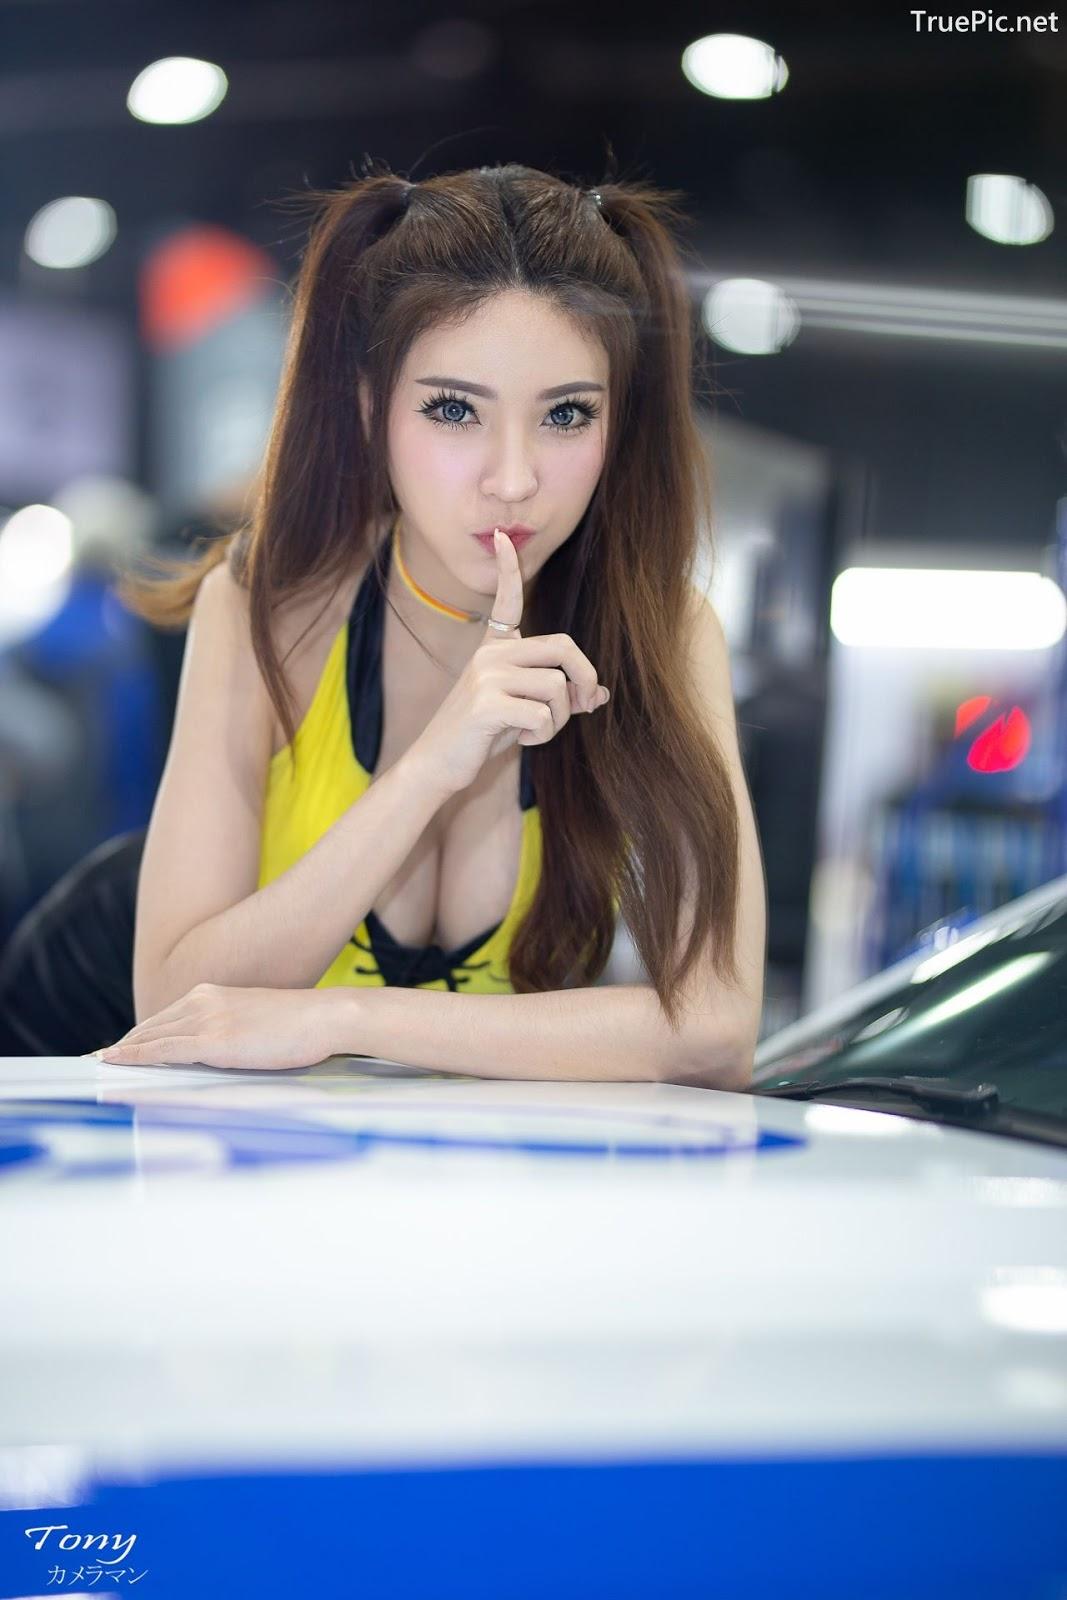 Image-Thailand-Hot-Model-Thai-Racing-Girl-At-Bangkok-Auto-Salon-2019-TruePic.net- Picture-6